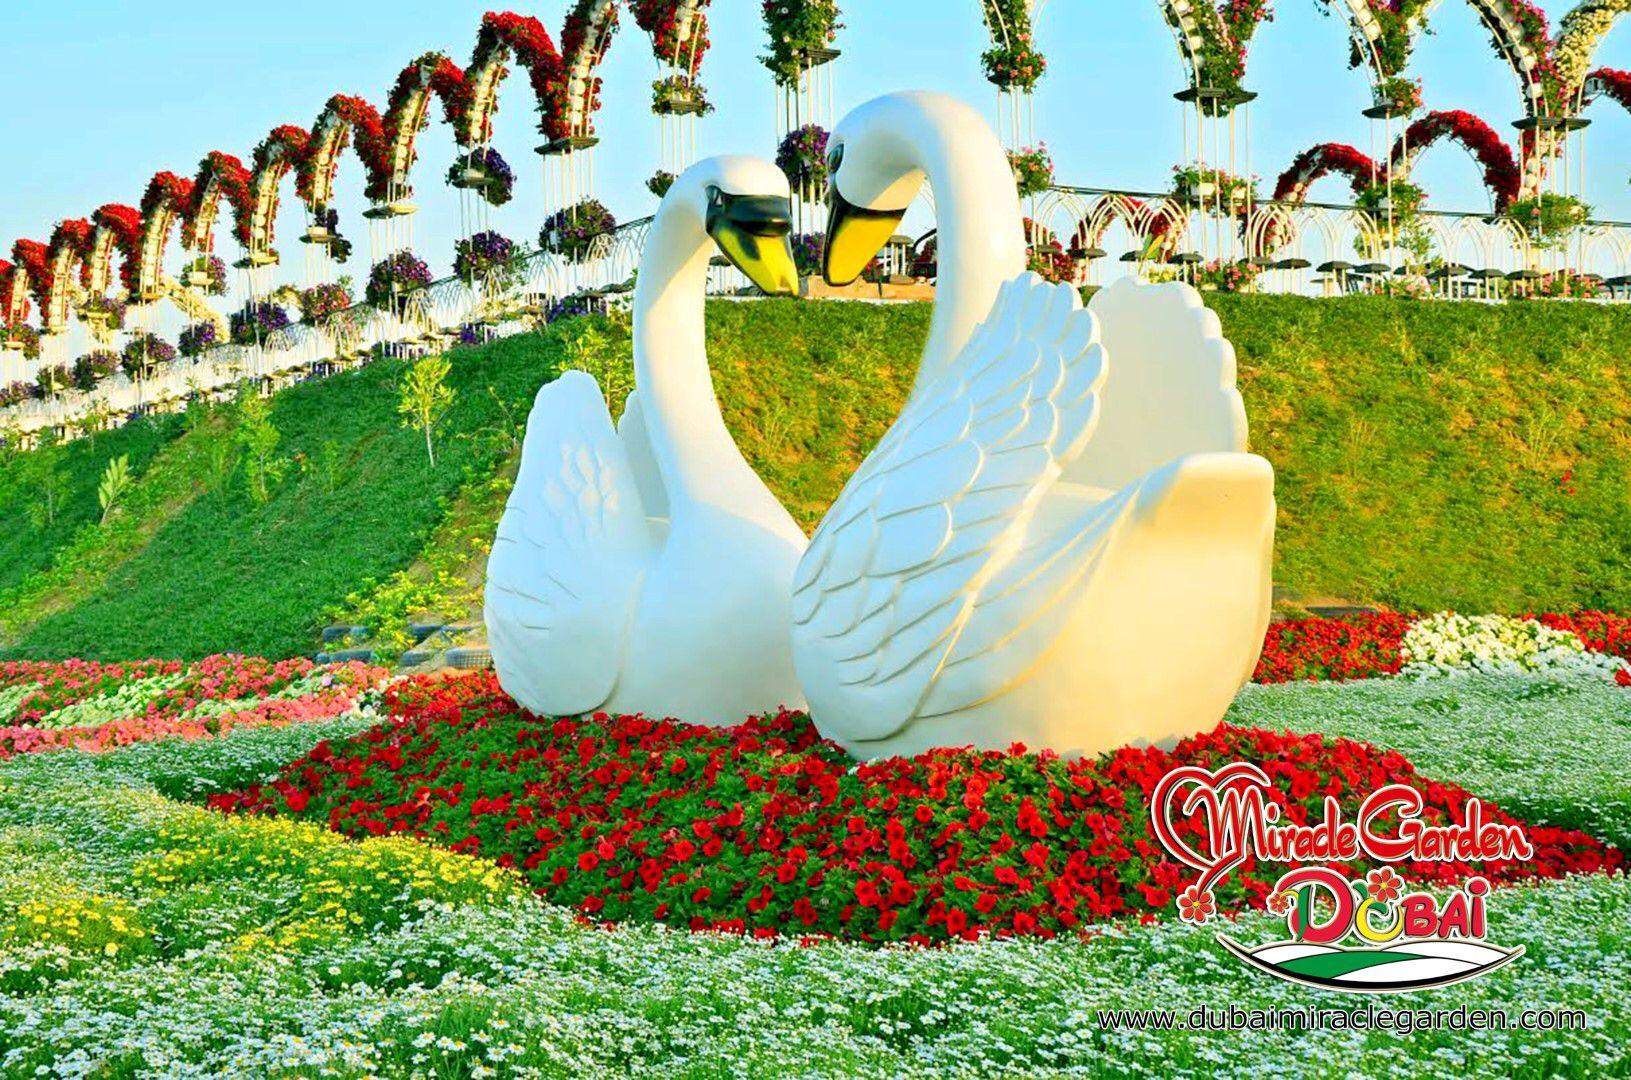 Image from http://cdn.architecturendesign.net/wp-content/uploads/2014/07/Dubai-Miracle-Garden-00.jpg.